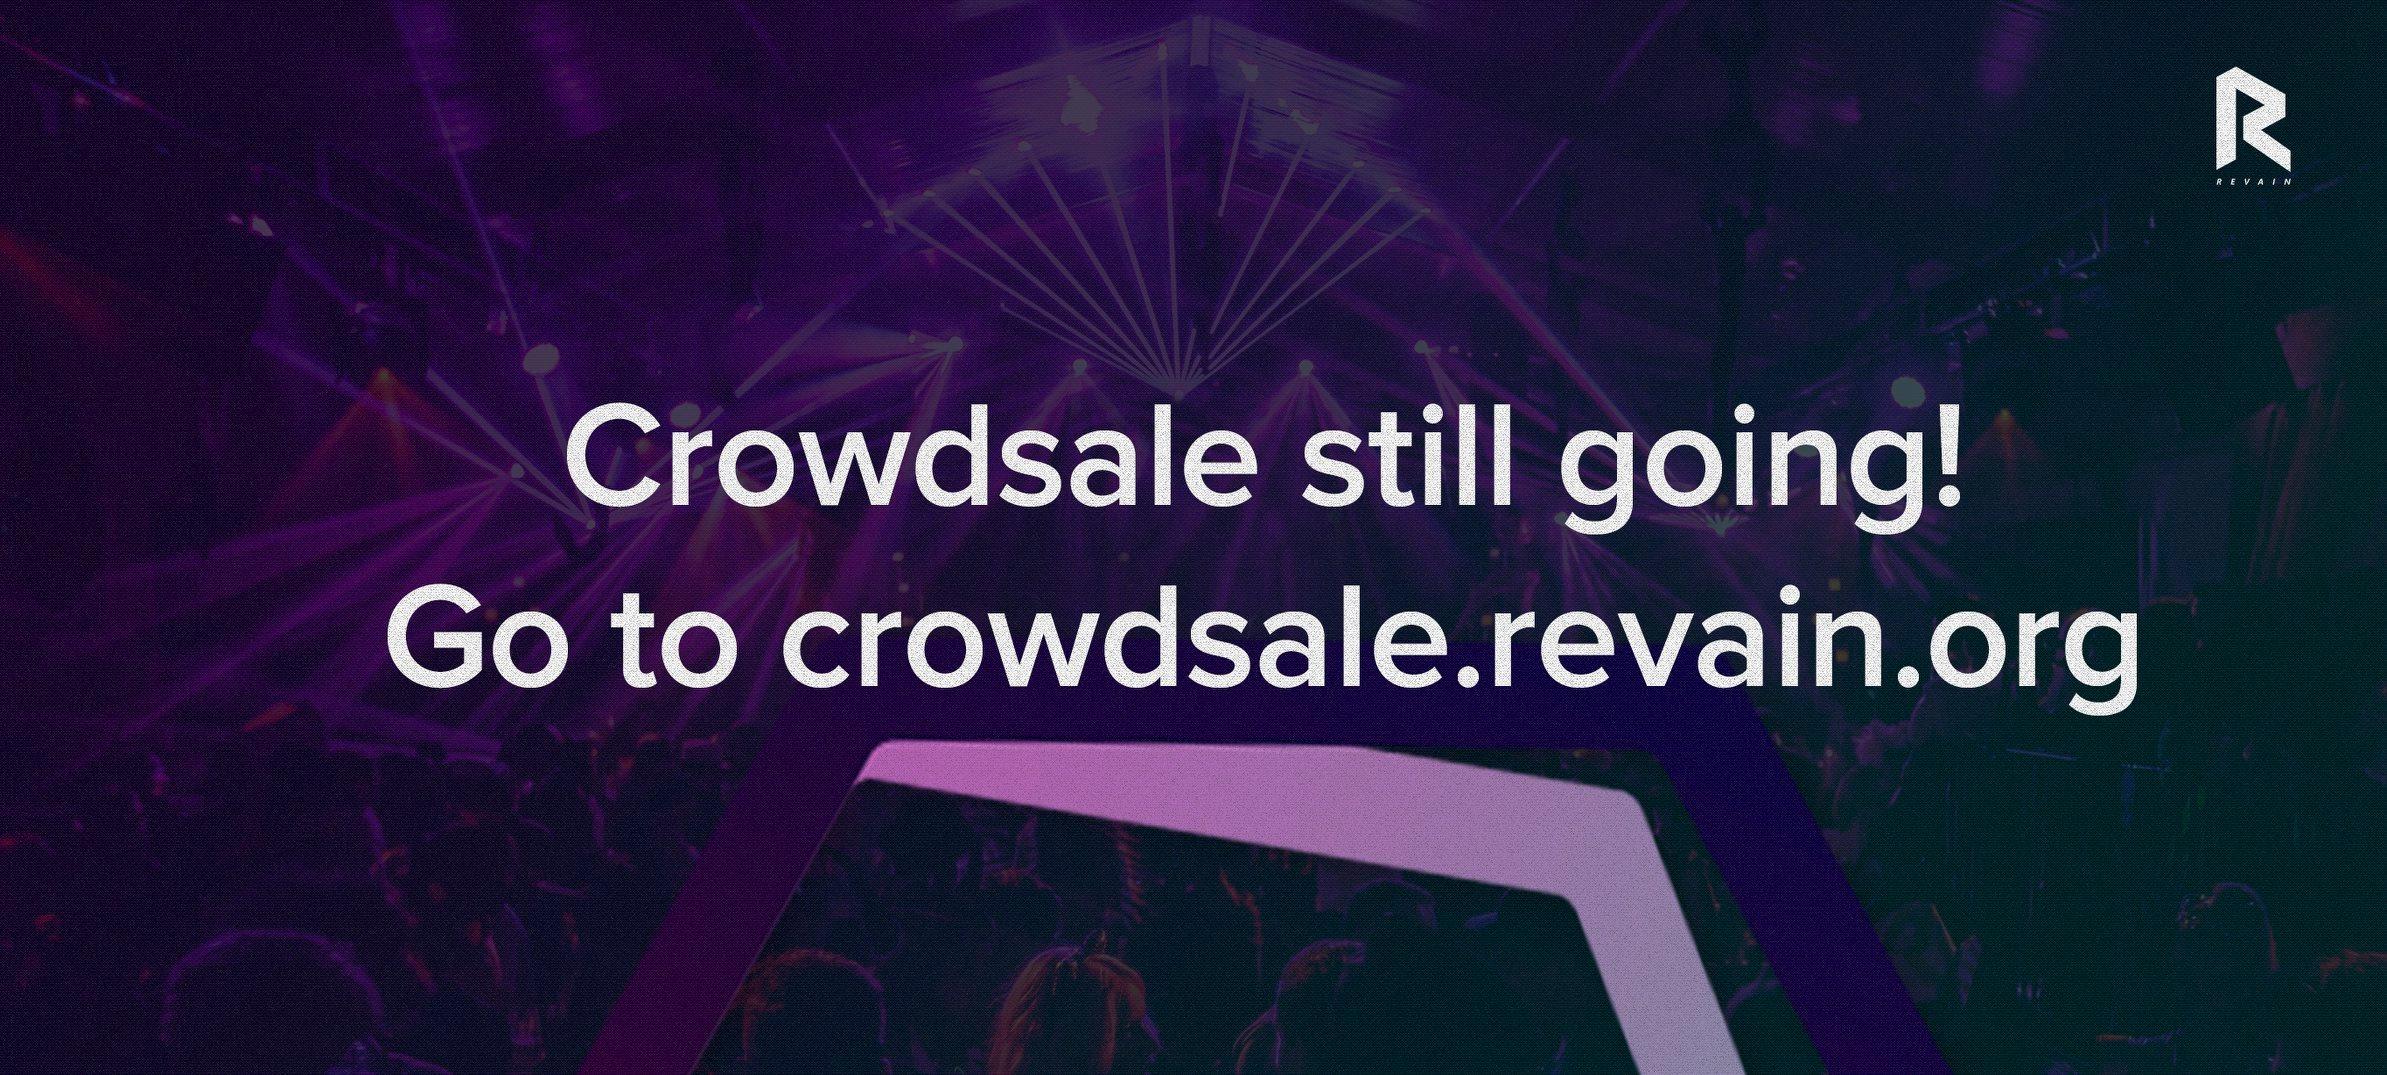 revain crowdsale